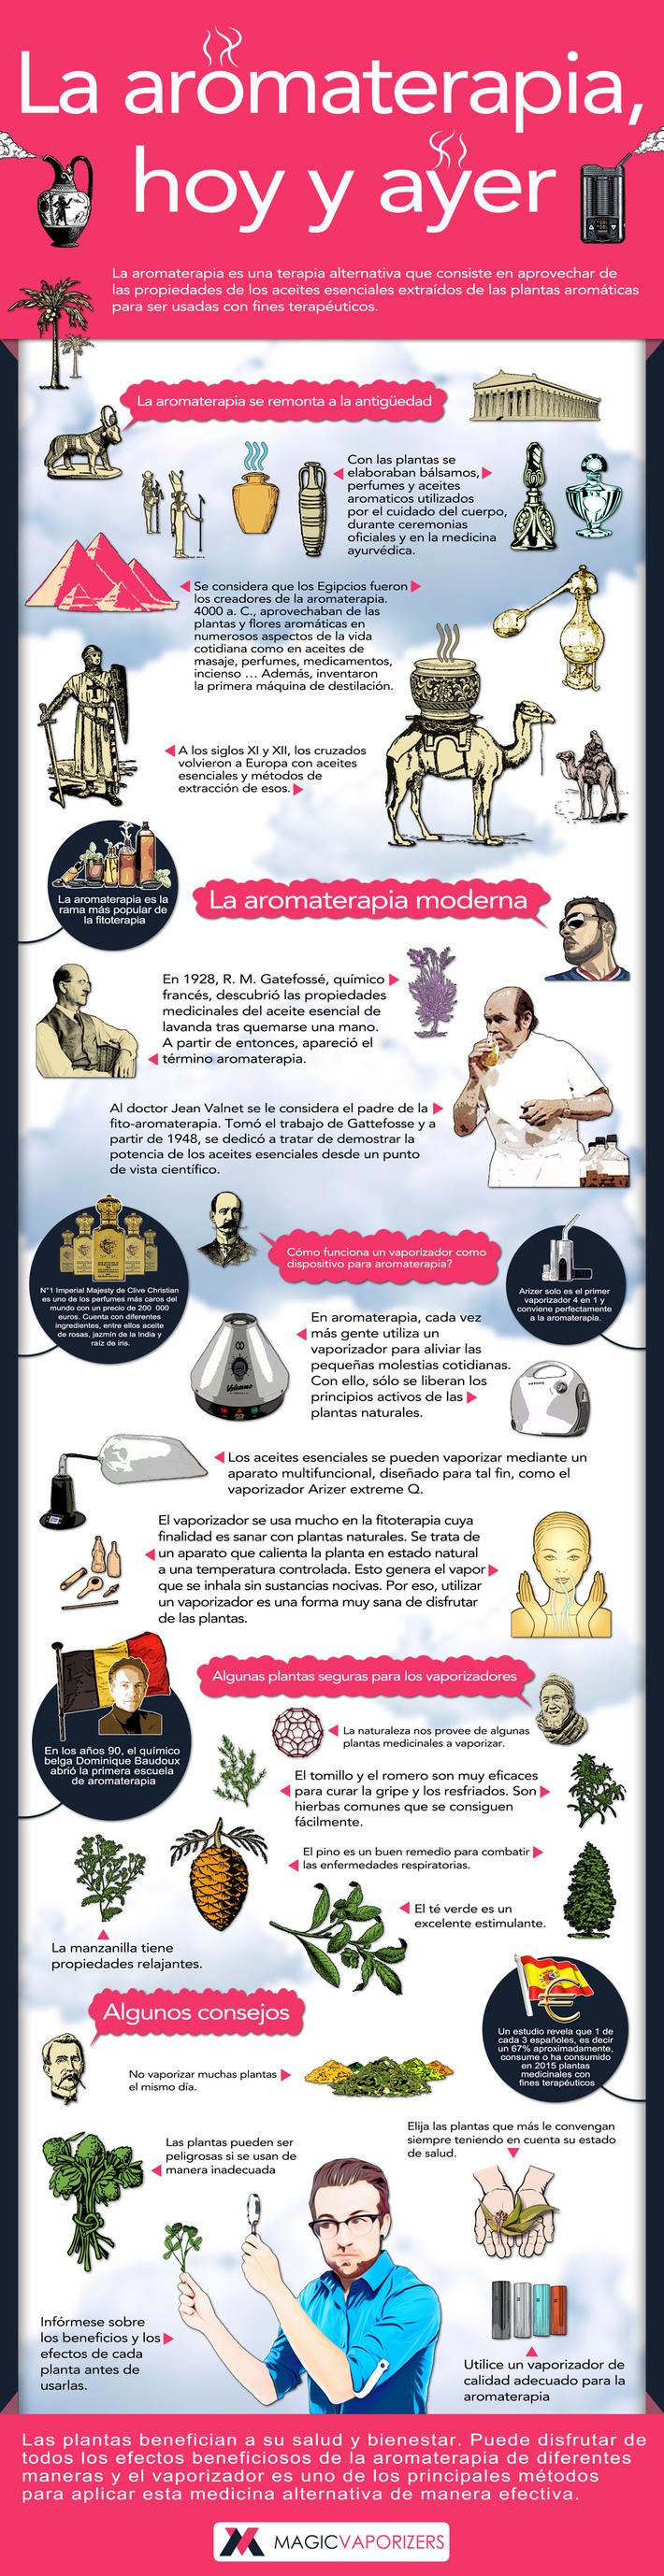 Historia y uso de la aromaterapia